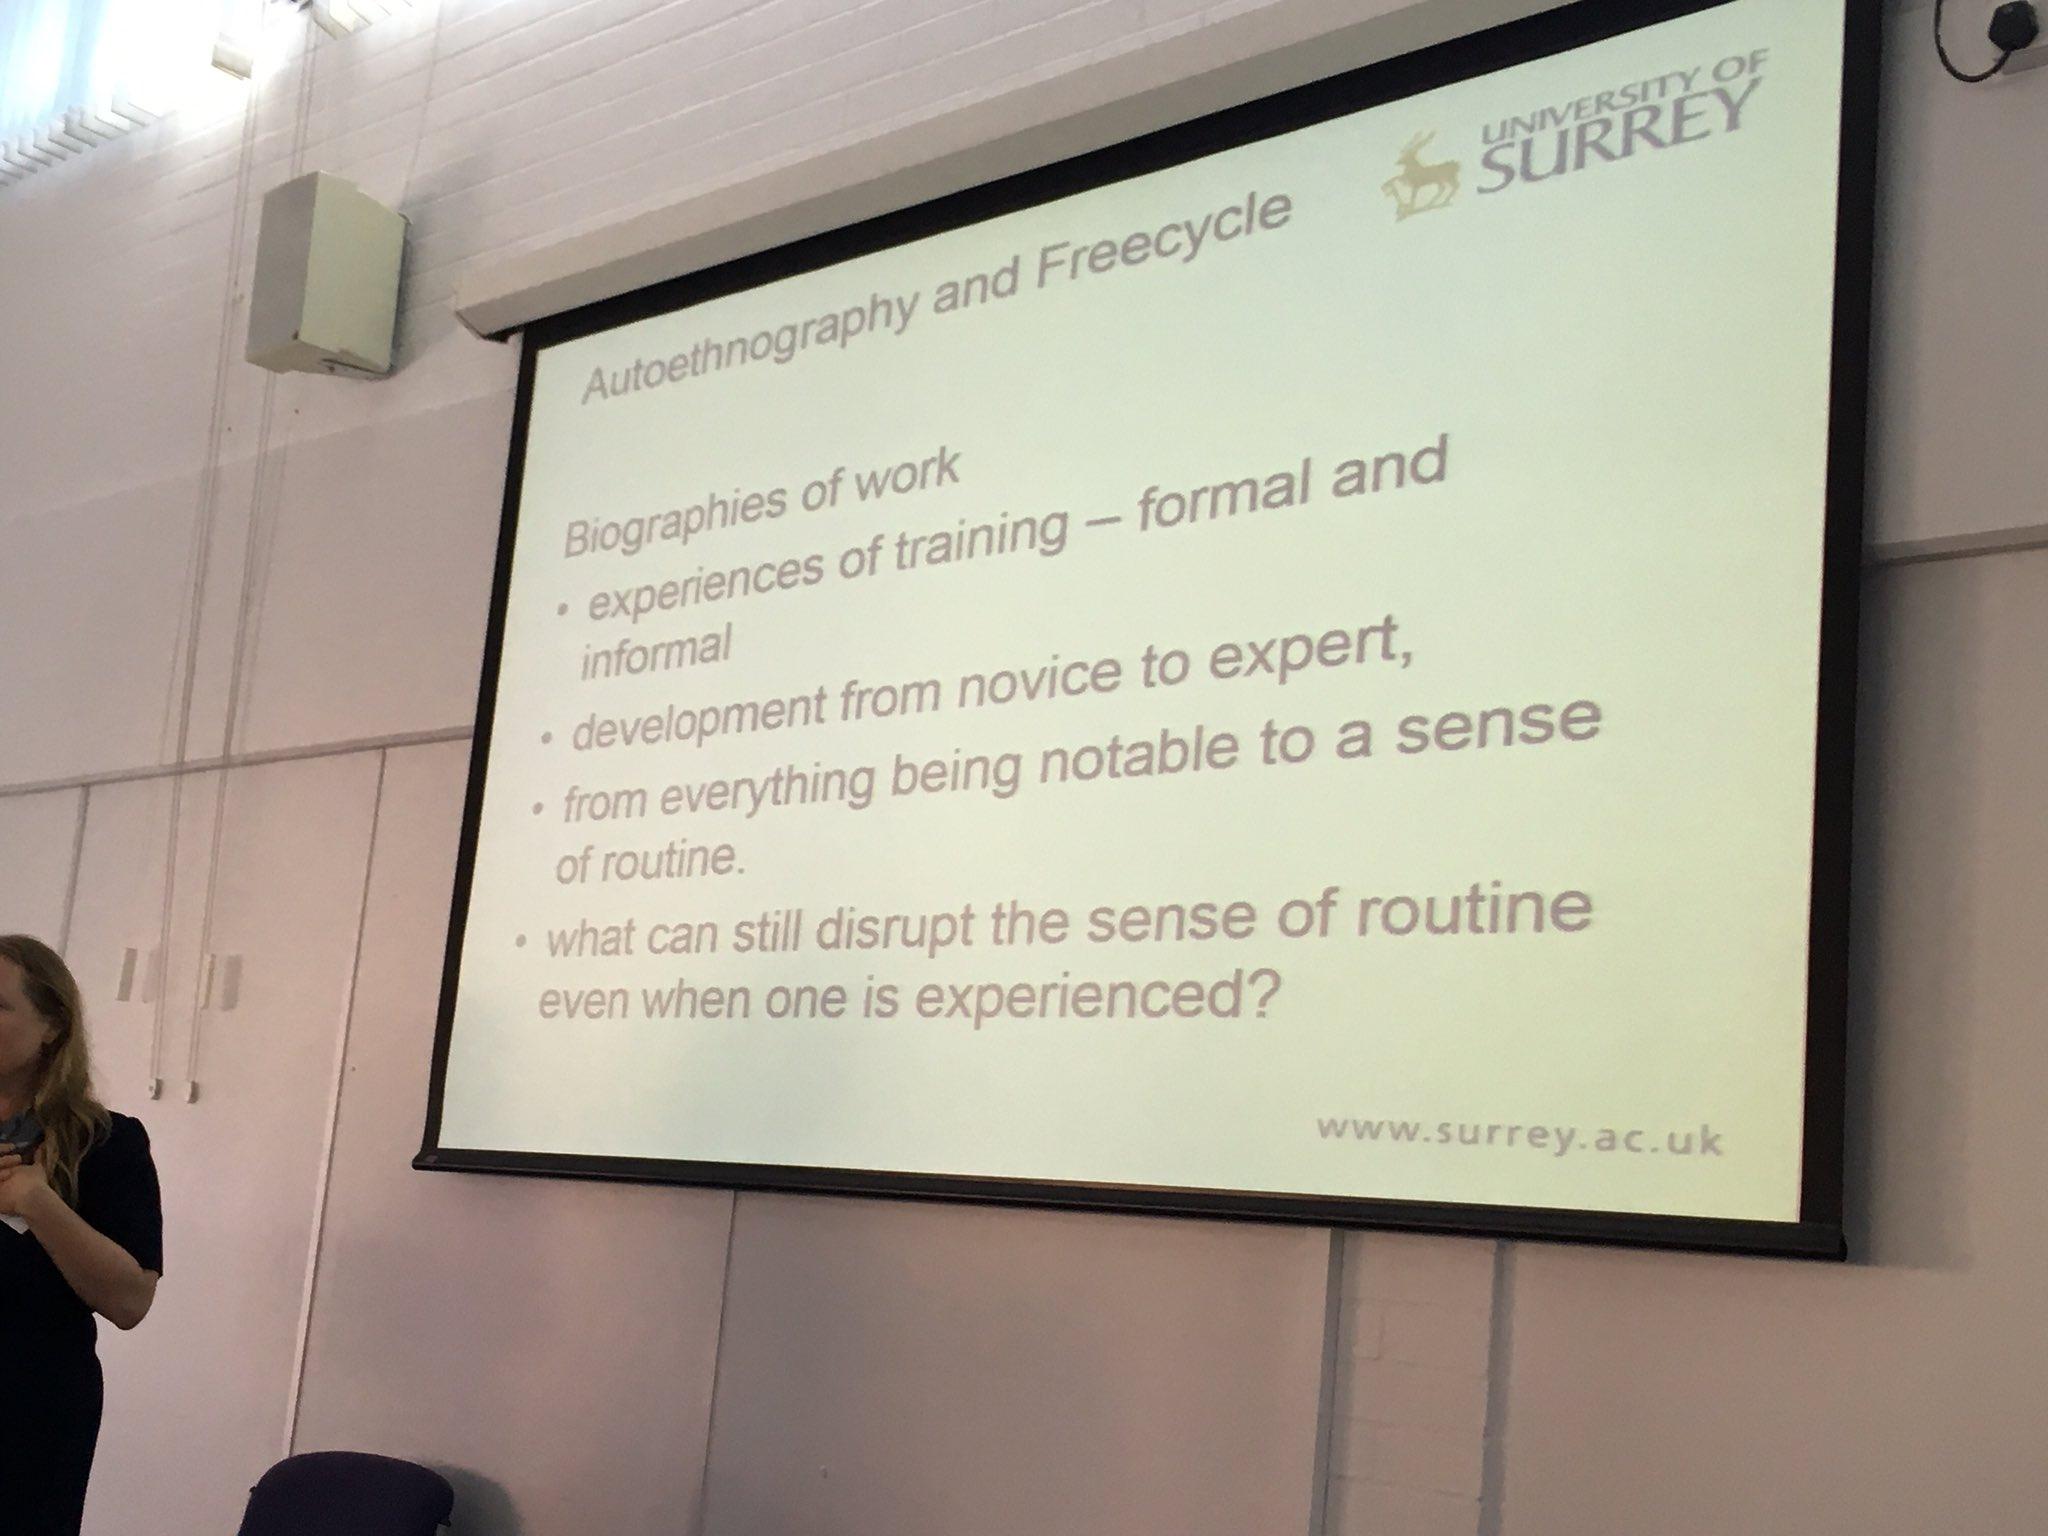 Fascinating talk from Chris Hine on how we might use autoethnography to capture digital work #RMDigital @SurreySociology @dosrhul https://t.co/hbANUjegzv